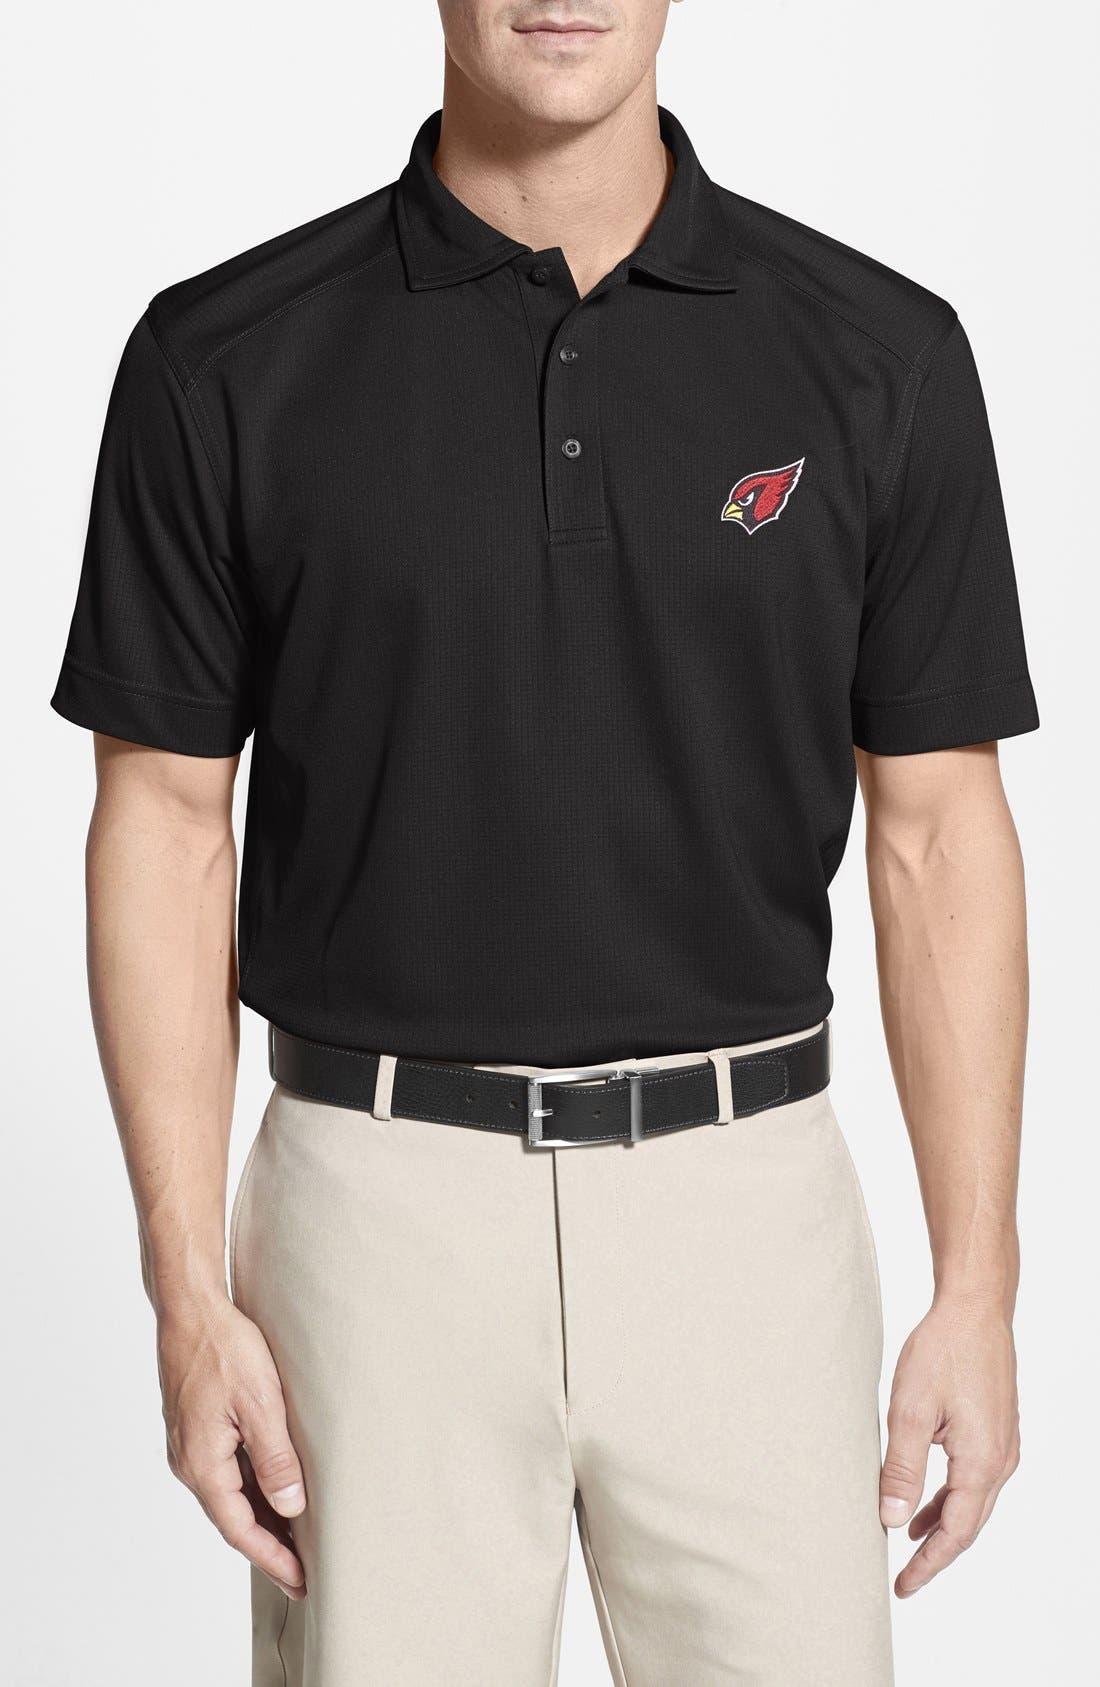 Arizona Cardinals - Genre DryTec Moisture Wicking Polo,                         Main,                         color, Black